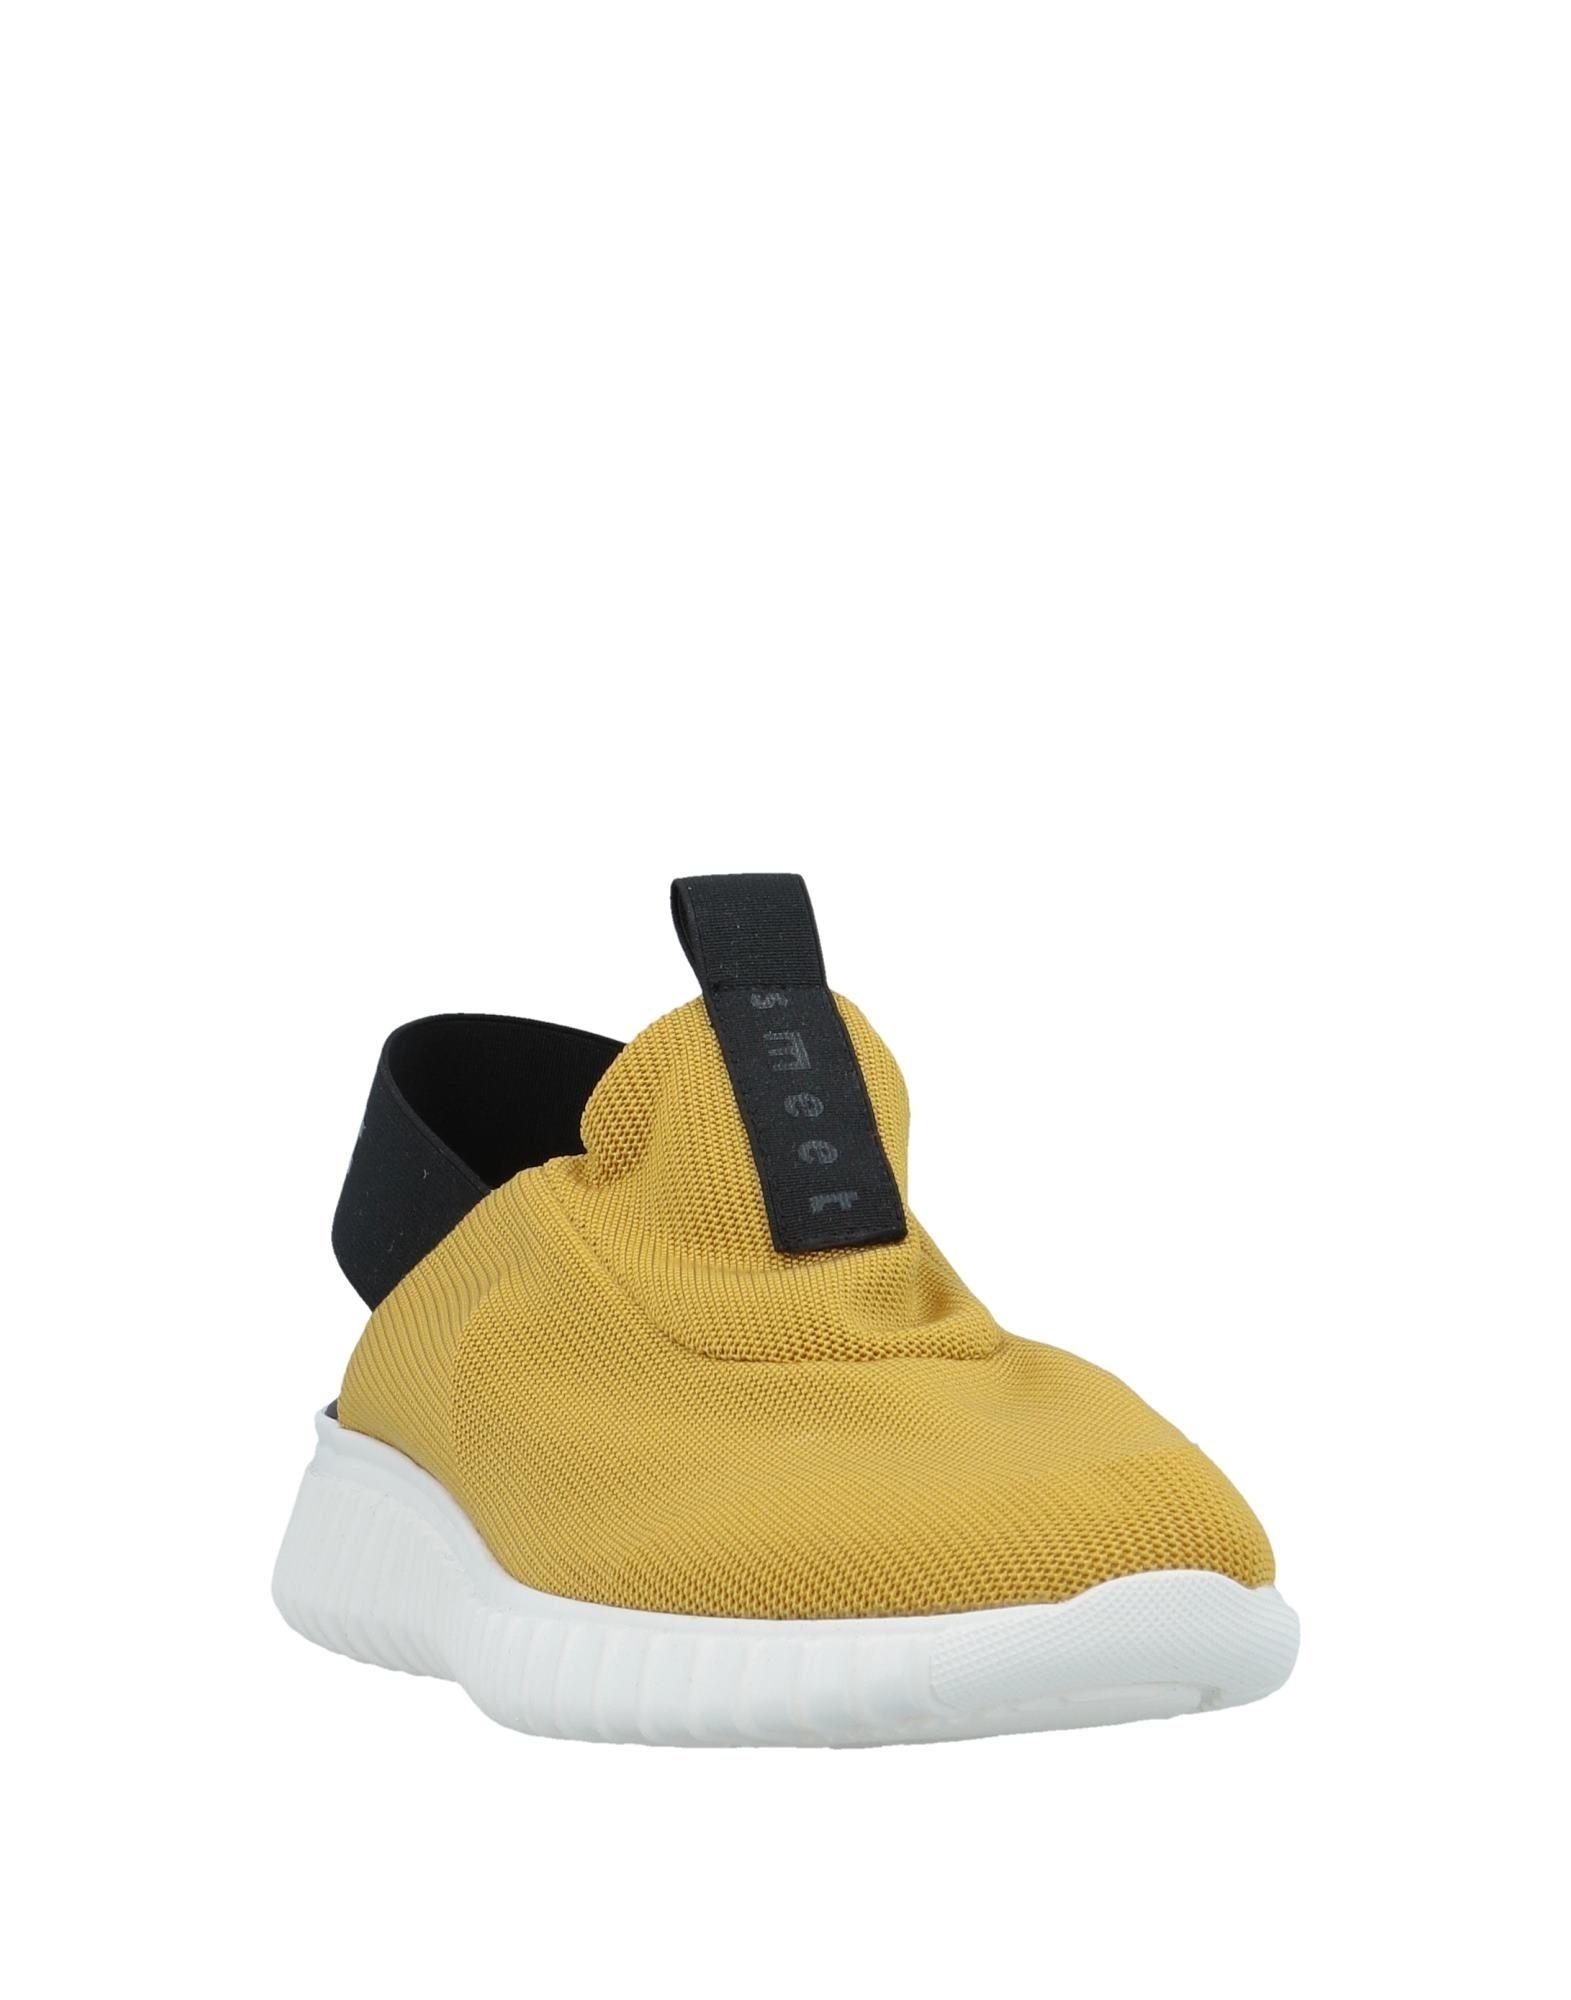 Stilvolle Damen billige Schuhe Smeet Sneakers Damen Stilvolle  11580746AP 99fc52